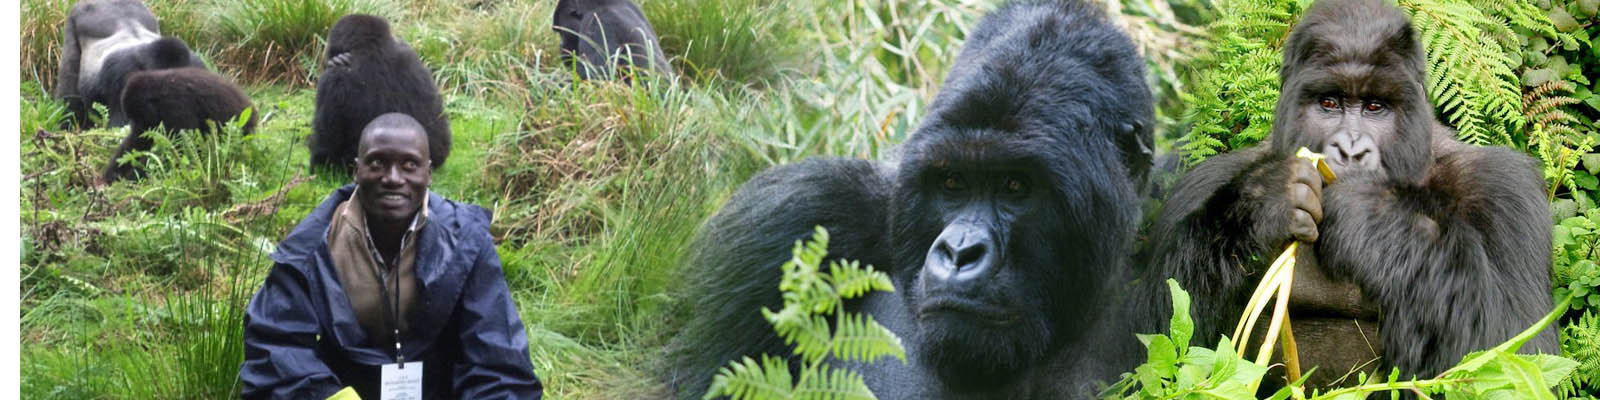 rwanda-gorilla-trekking-safaris